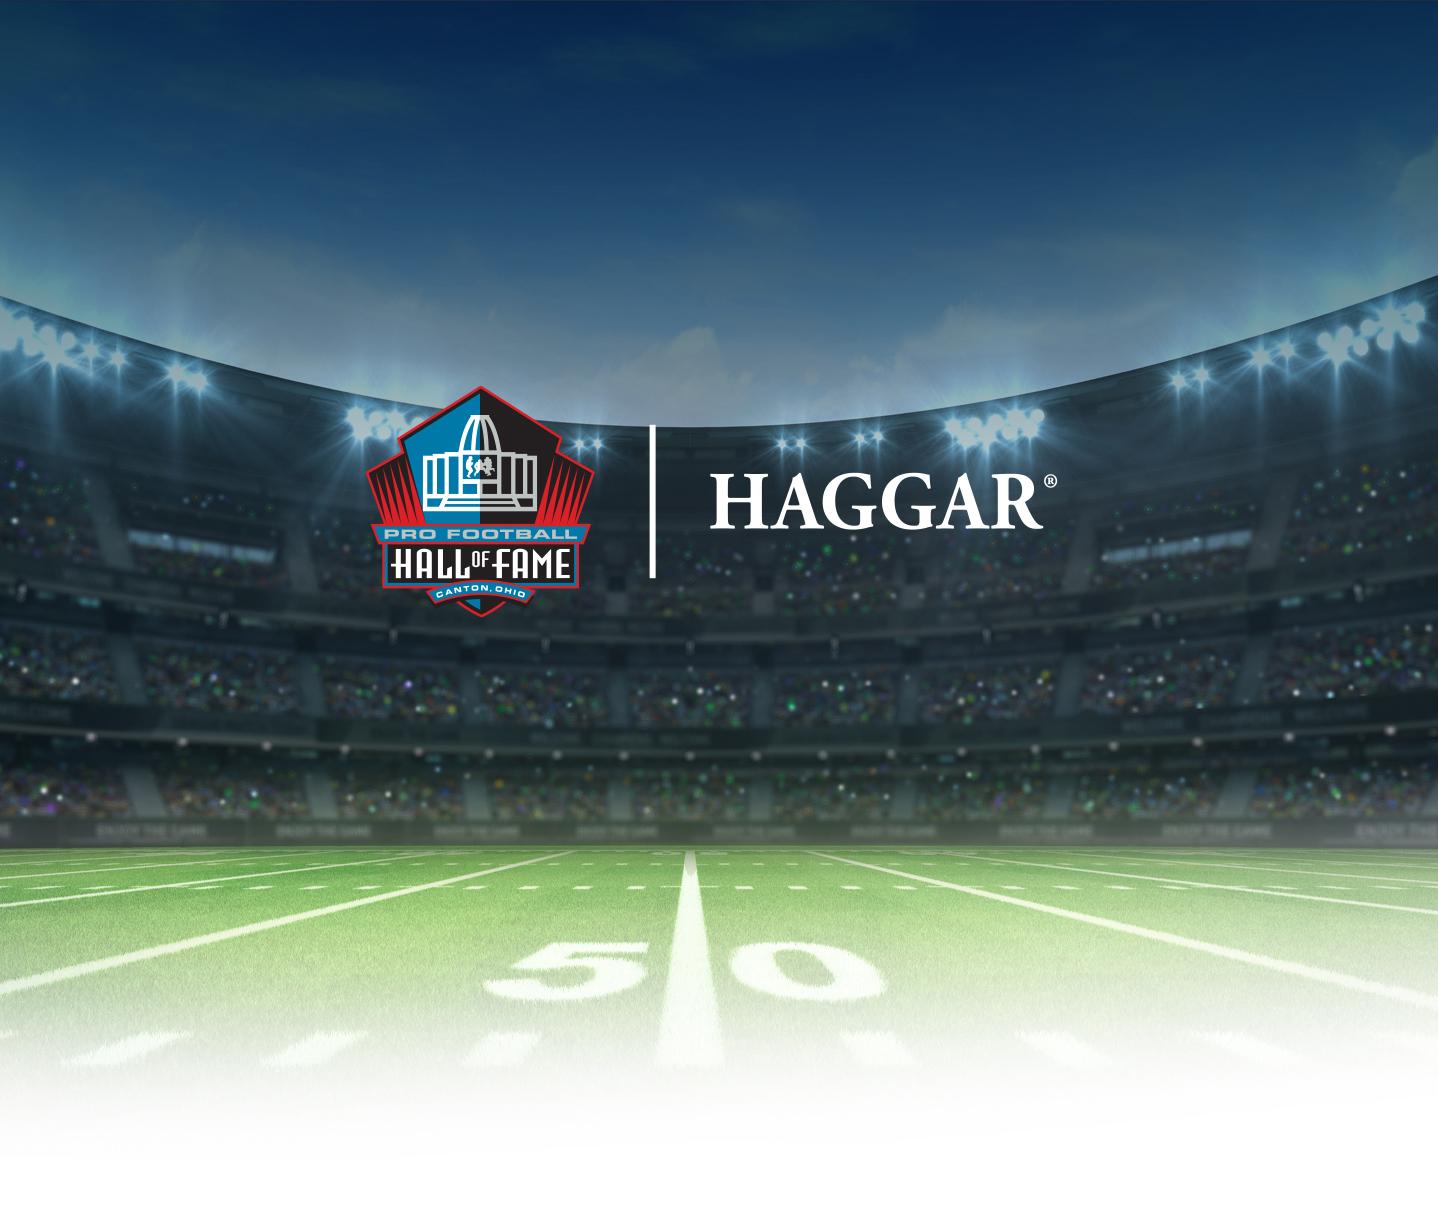 Pro Football Hall of Fame & Haggar logos